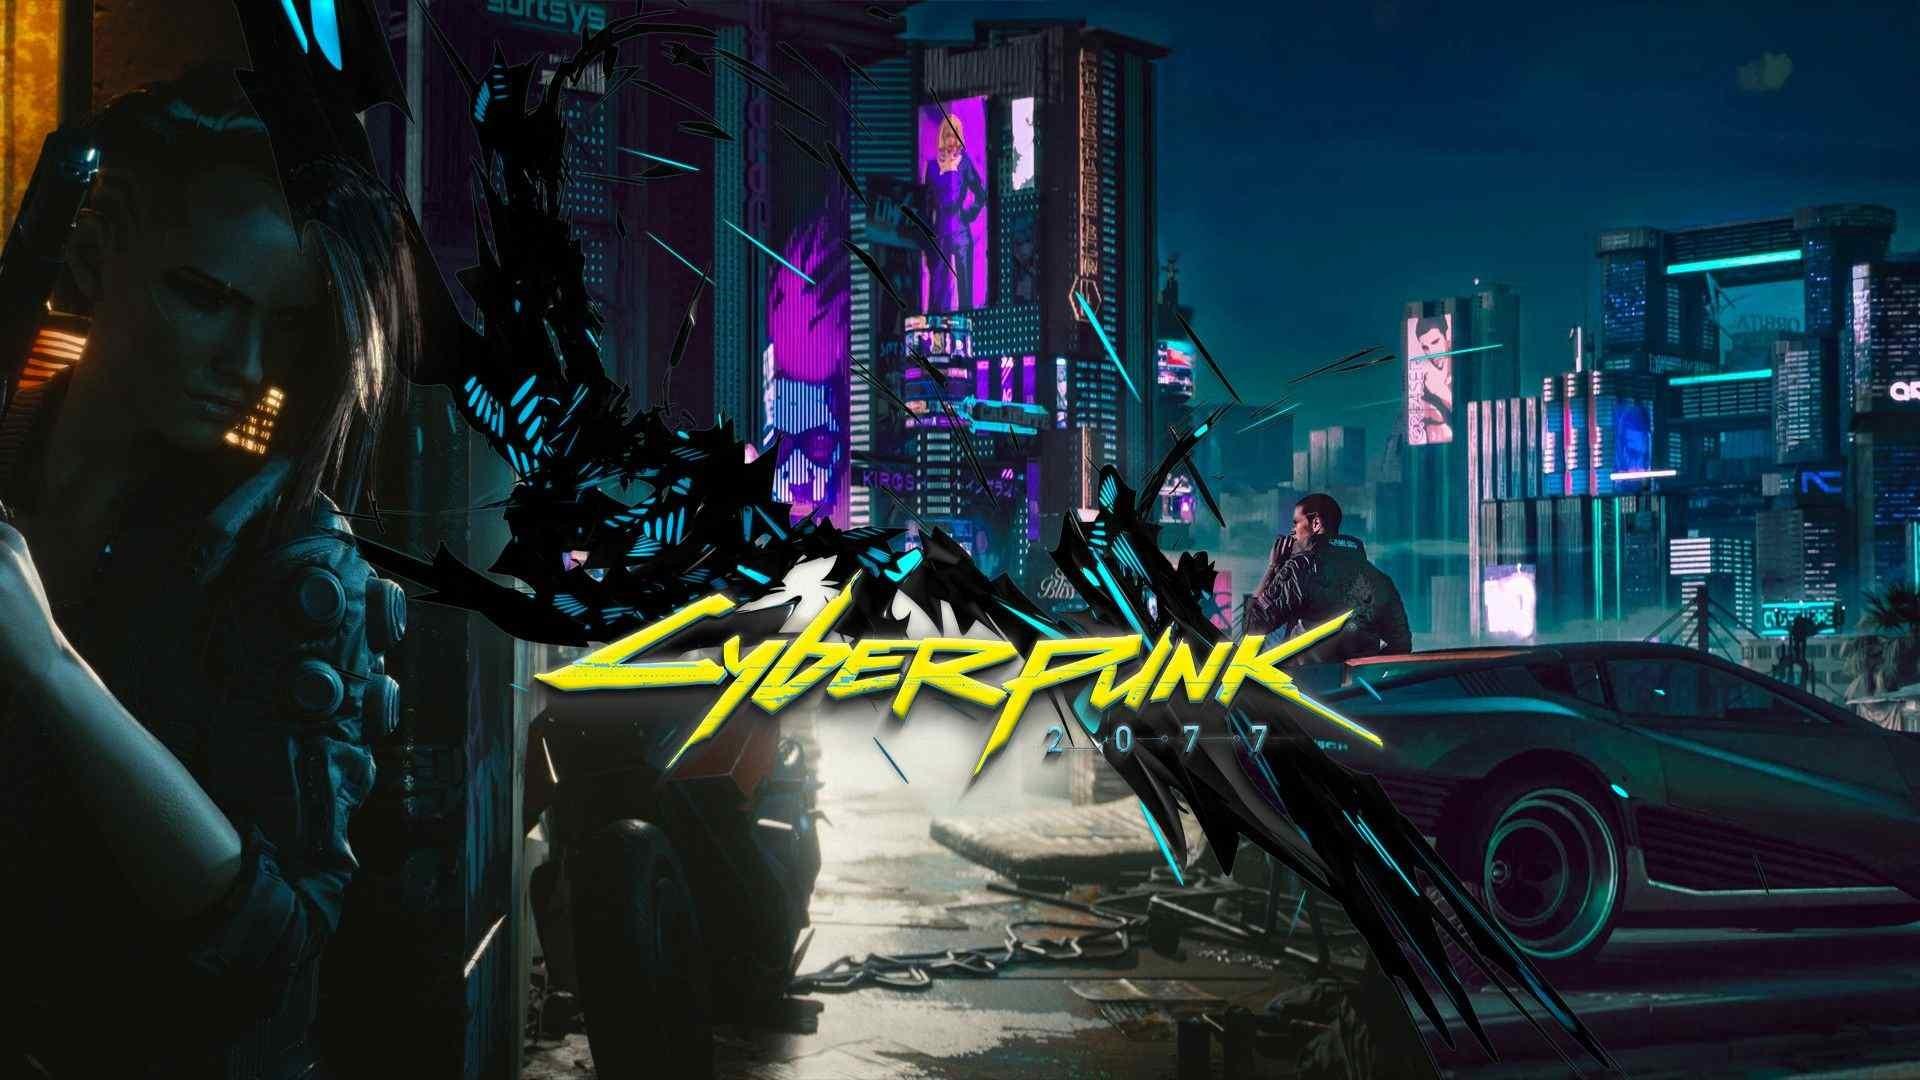 لعبة Cyberrpunk 2077